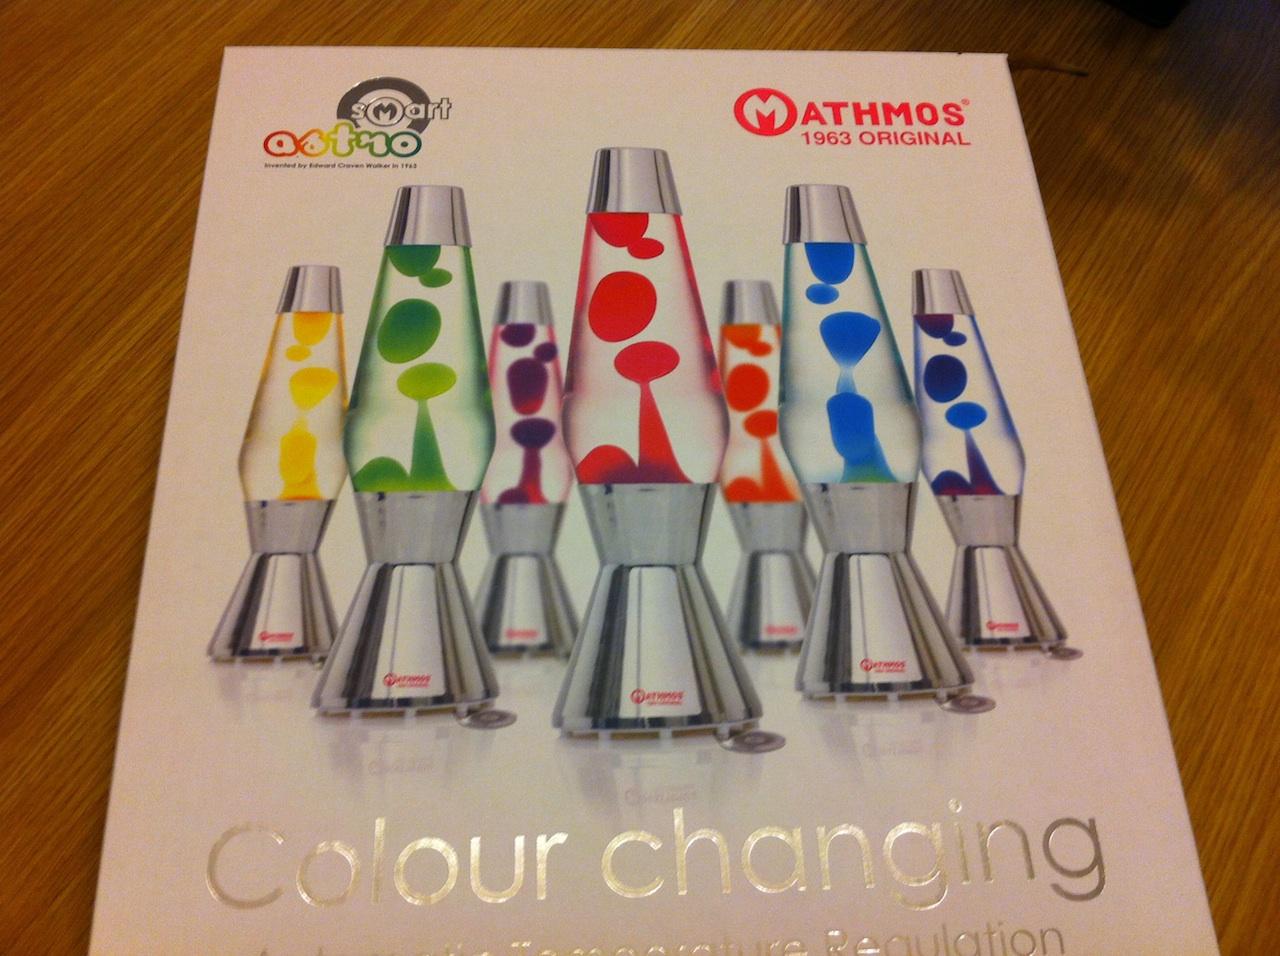 Mathmos Smart Astro Colour Changing Lava Lamp Review